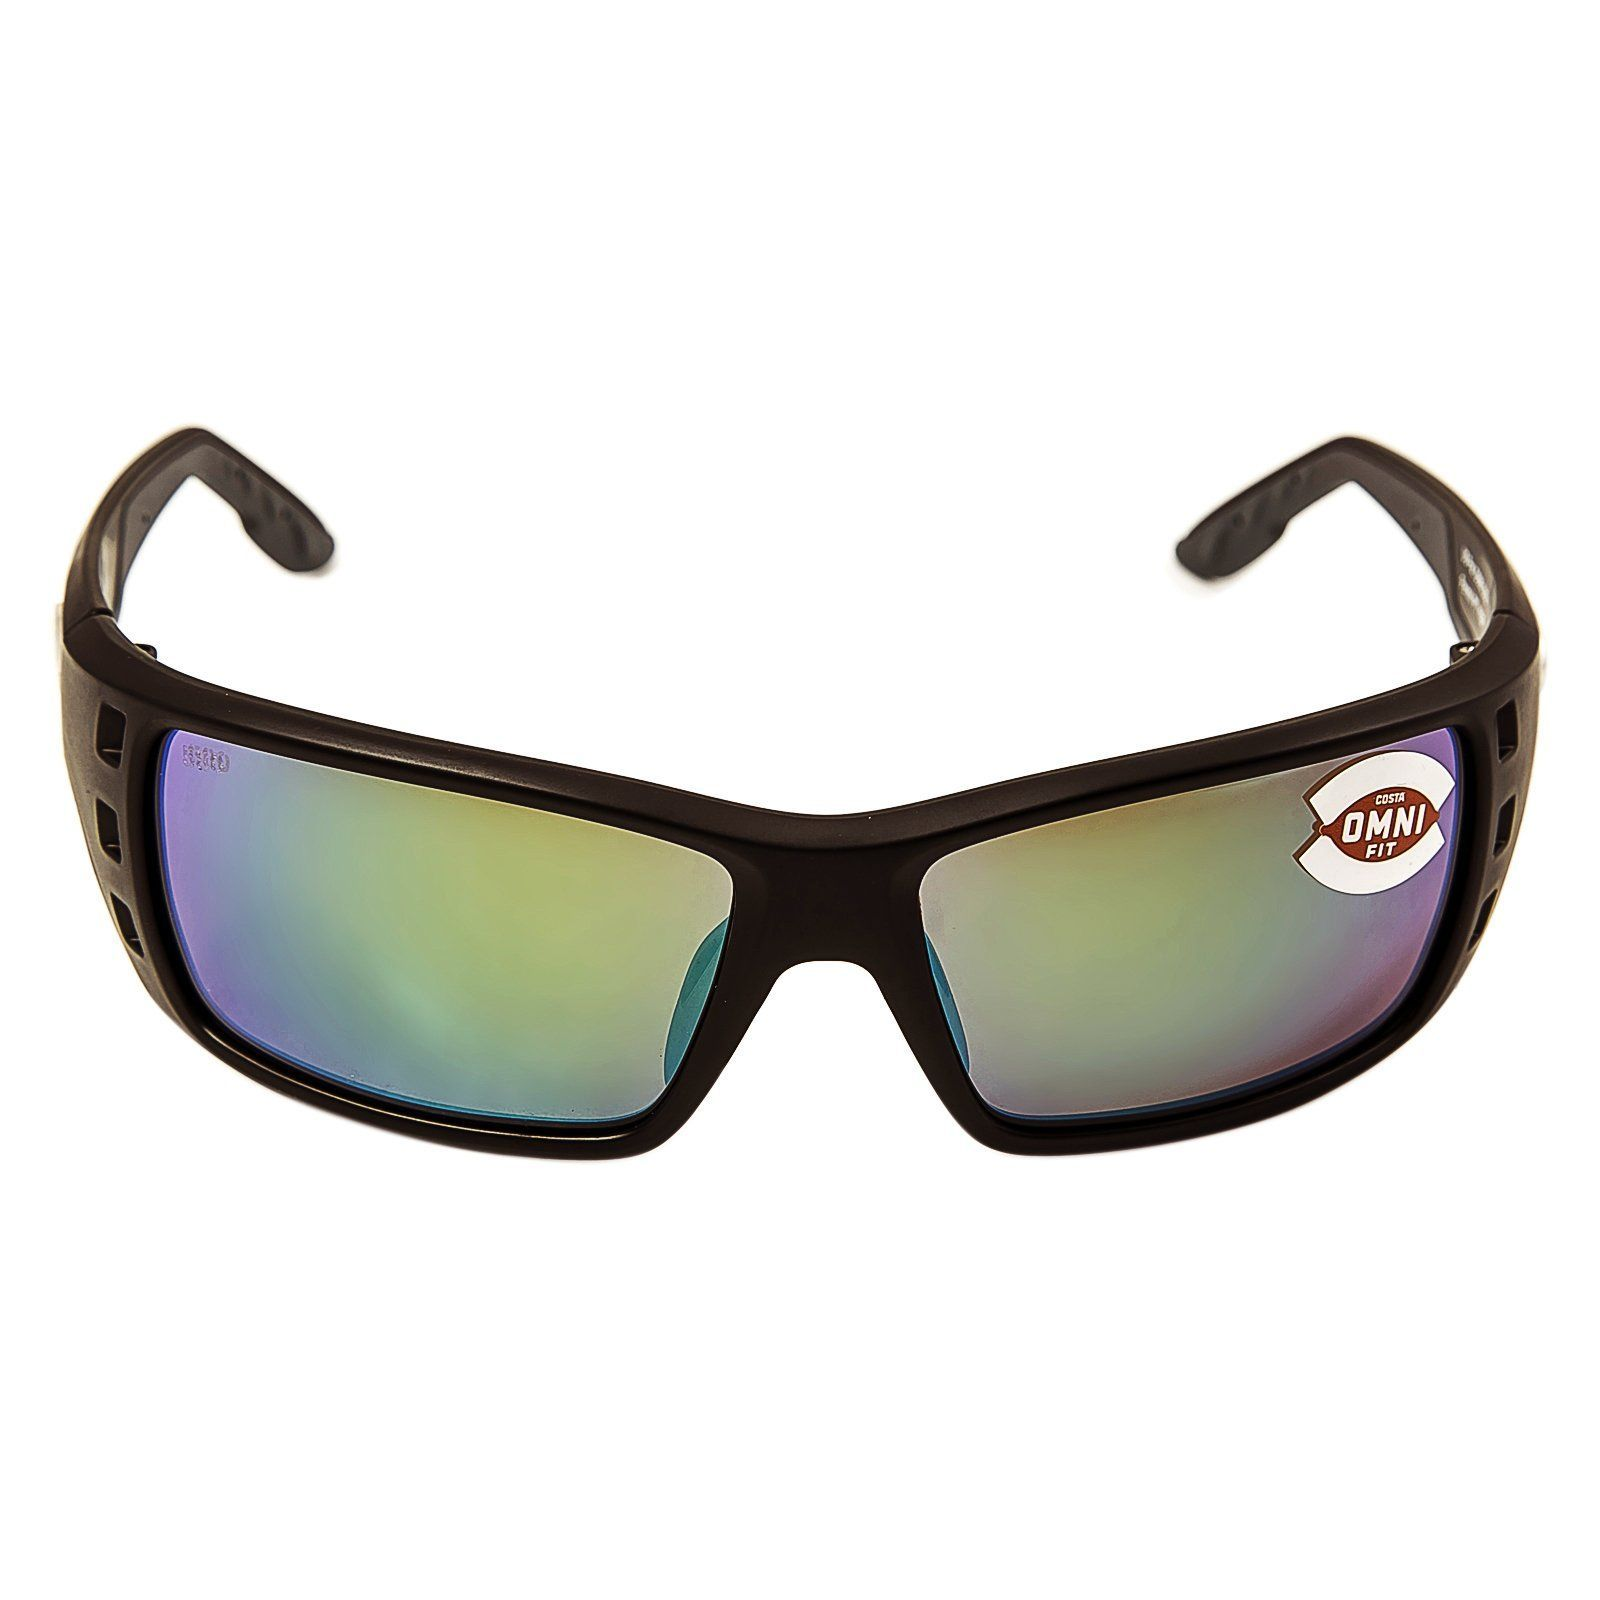 Fuse Lenses Non-Polarized Replacement Lenses for Maui Jim Front Street MJ-431